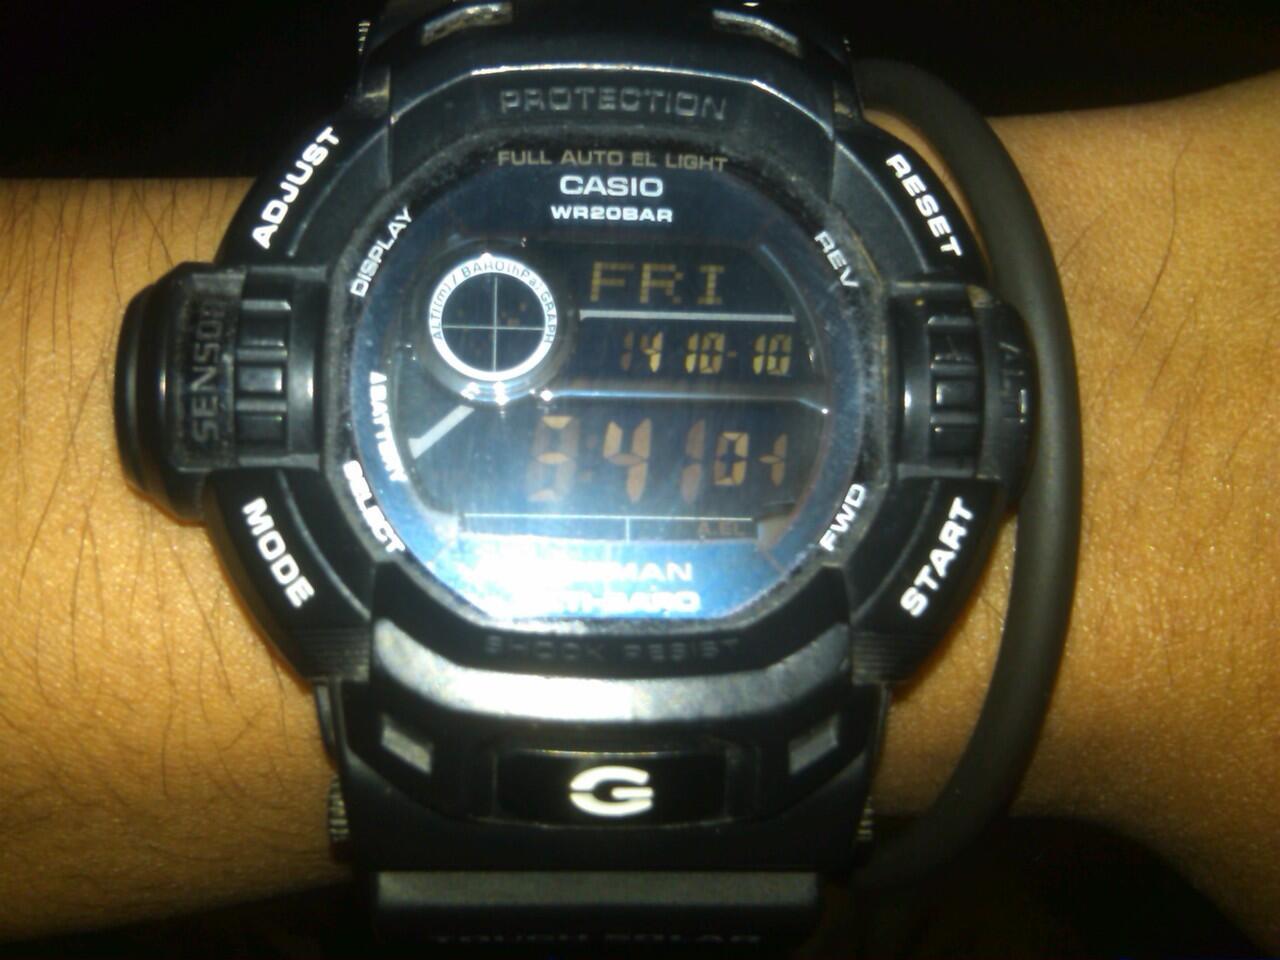 Terjual CASIO G-SHOCK G9200 BW BANJARMASIN  1e2b8bb7e8